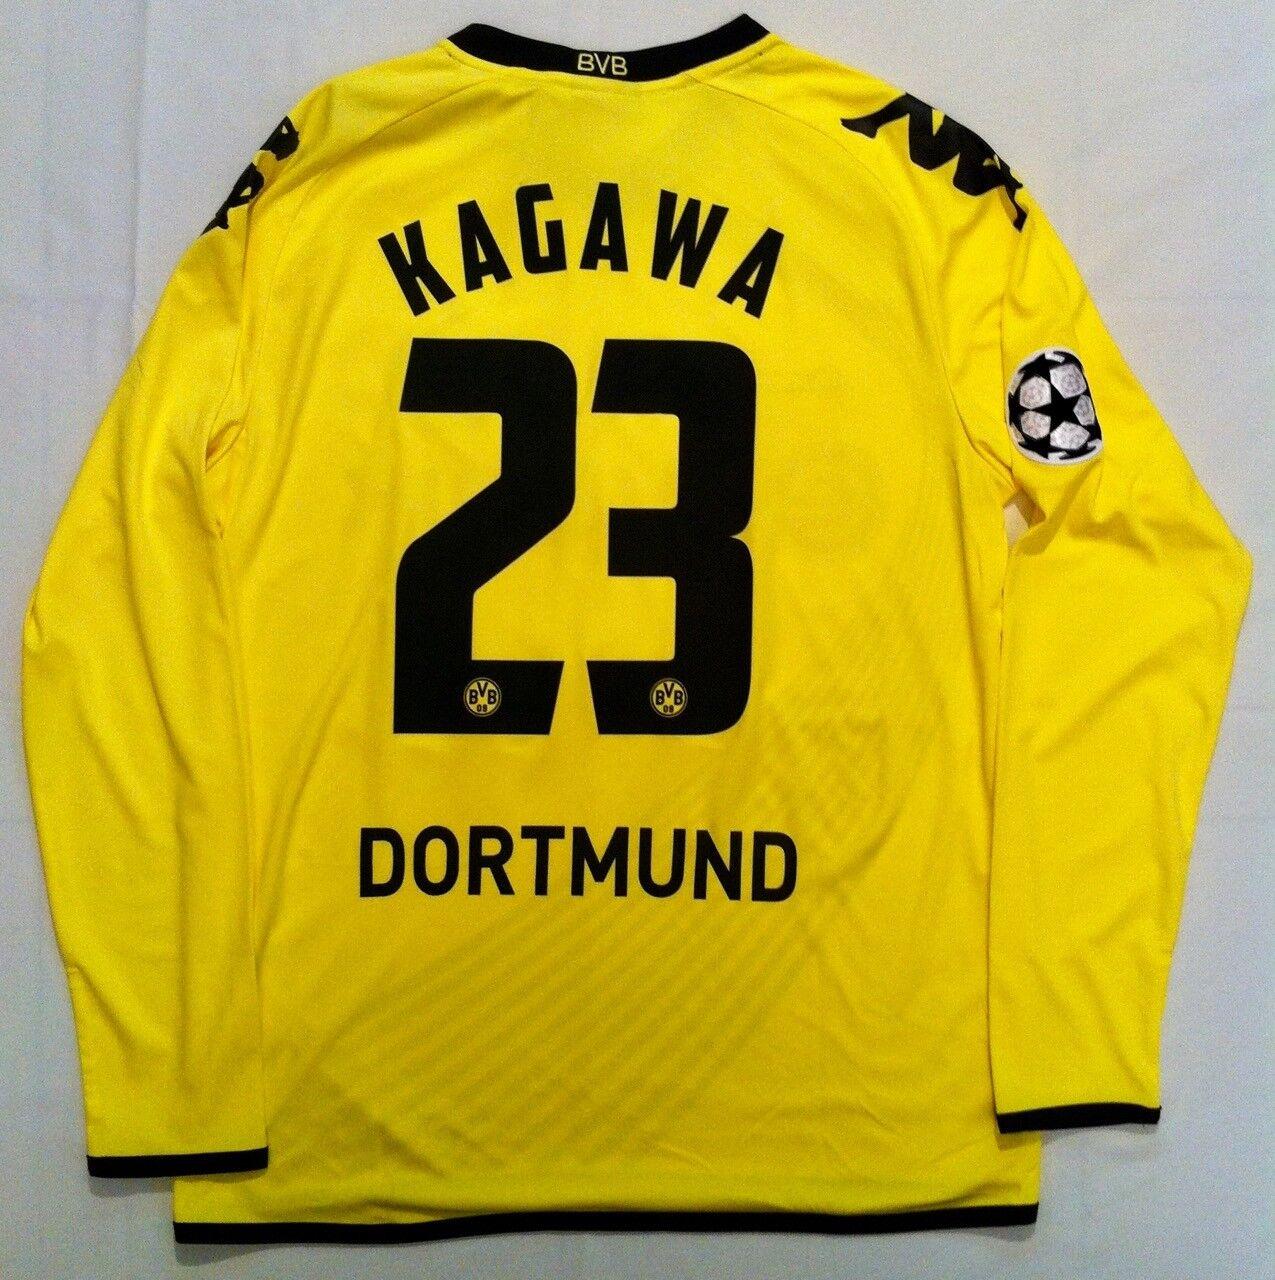 Camiseta Borussia Dortmund Kappa Champions League 2011 2012 Shinji Kagawa